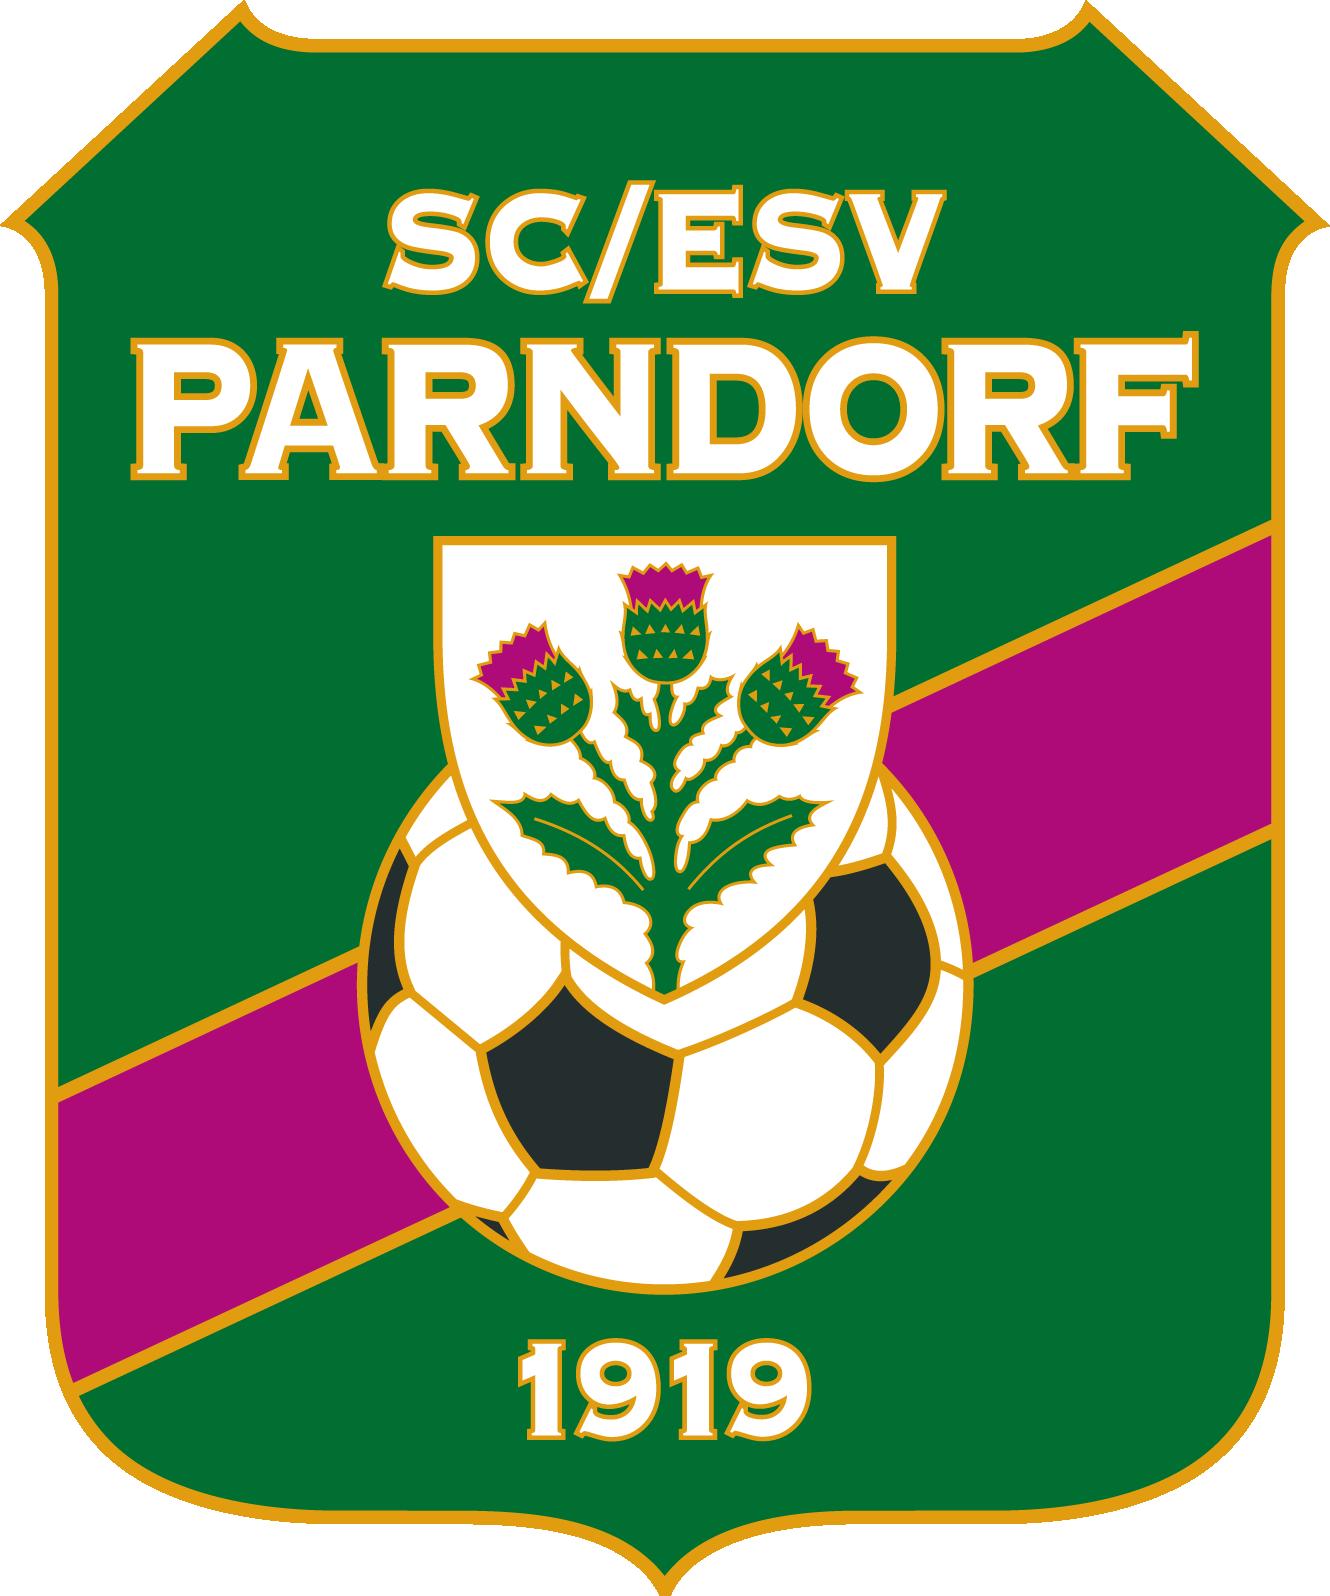 SC ESV Parndorf Football logo, Football team logos, Team